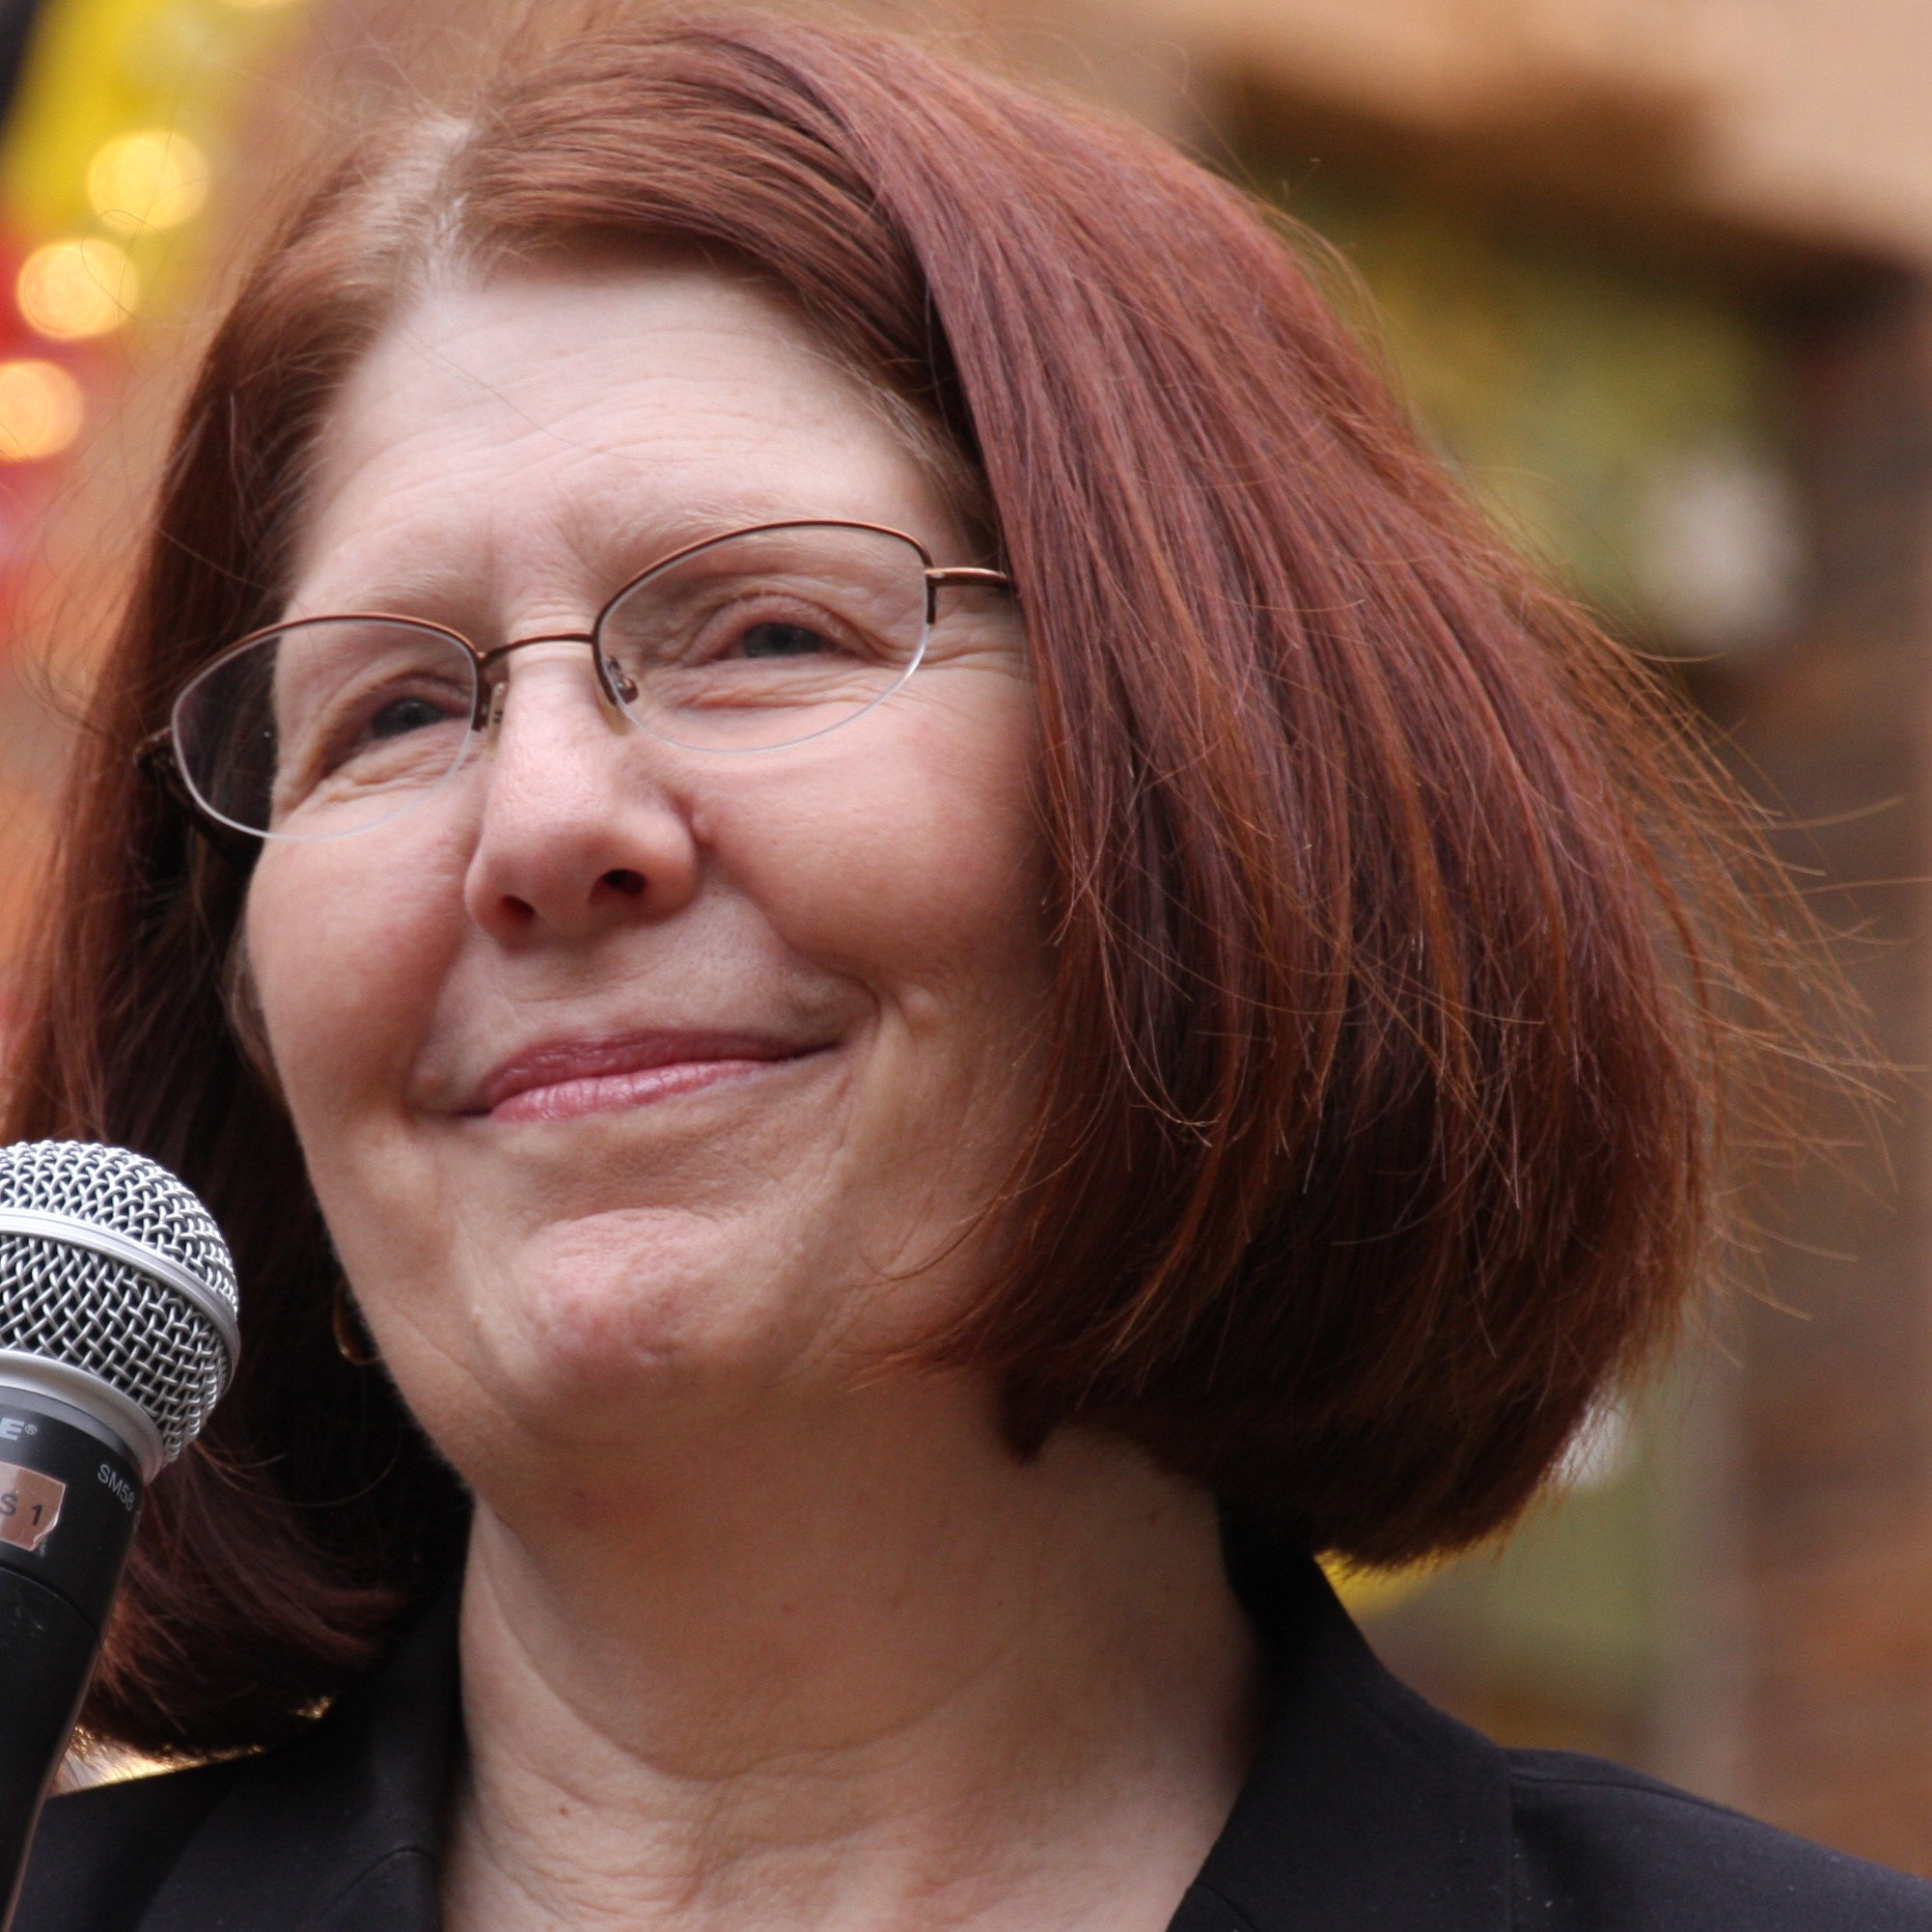 Monika Radziwon